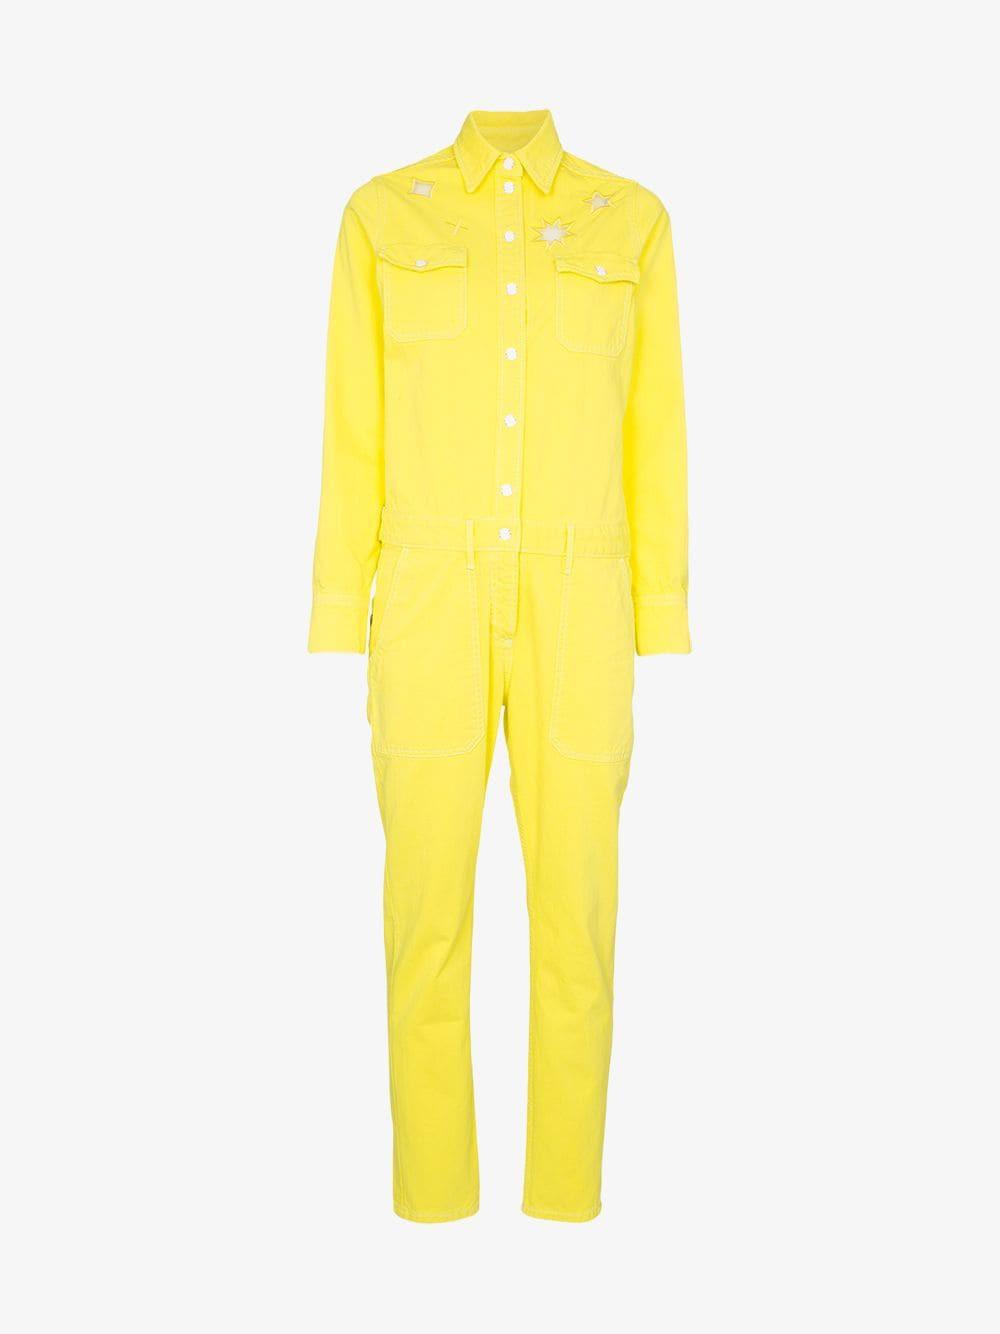 Mira Mikati it's magic cotton jumpsuit in yellow